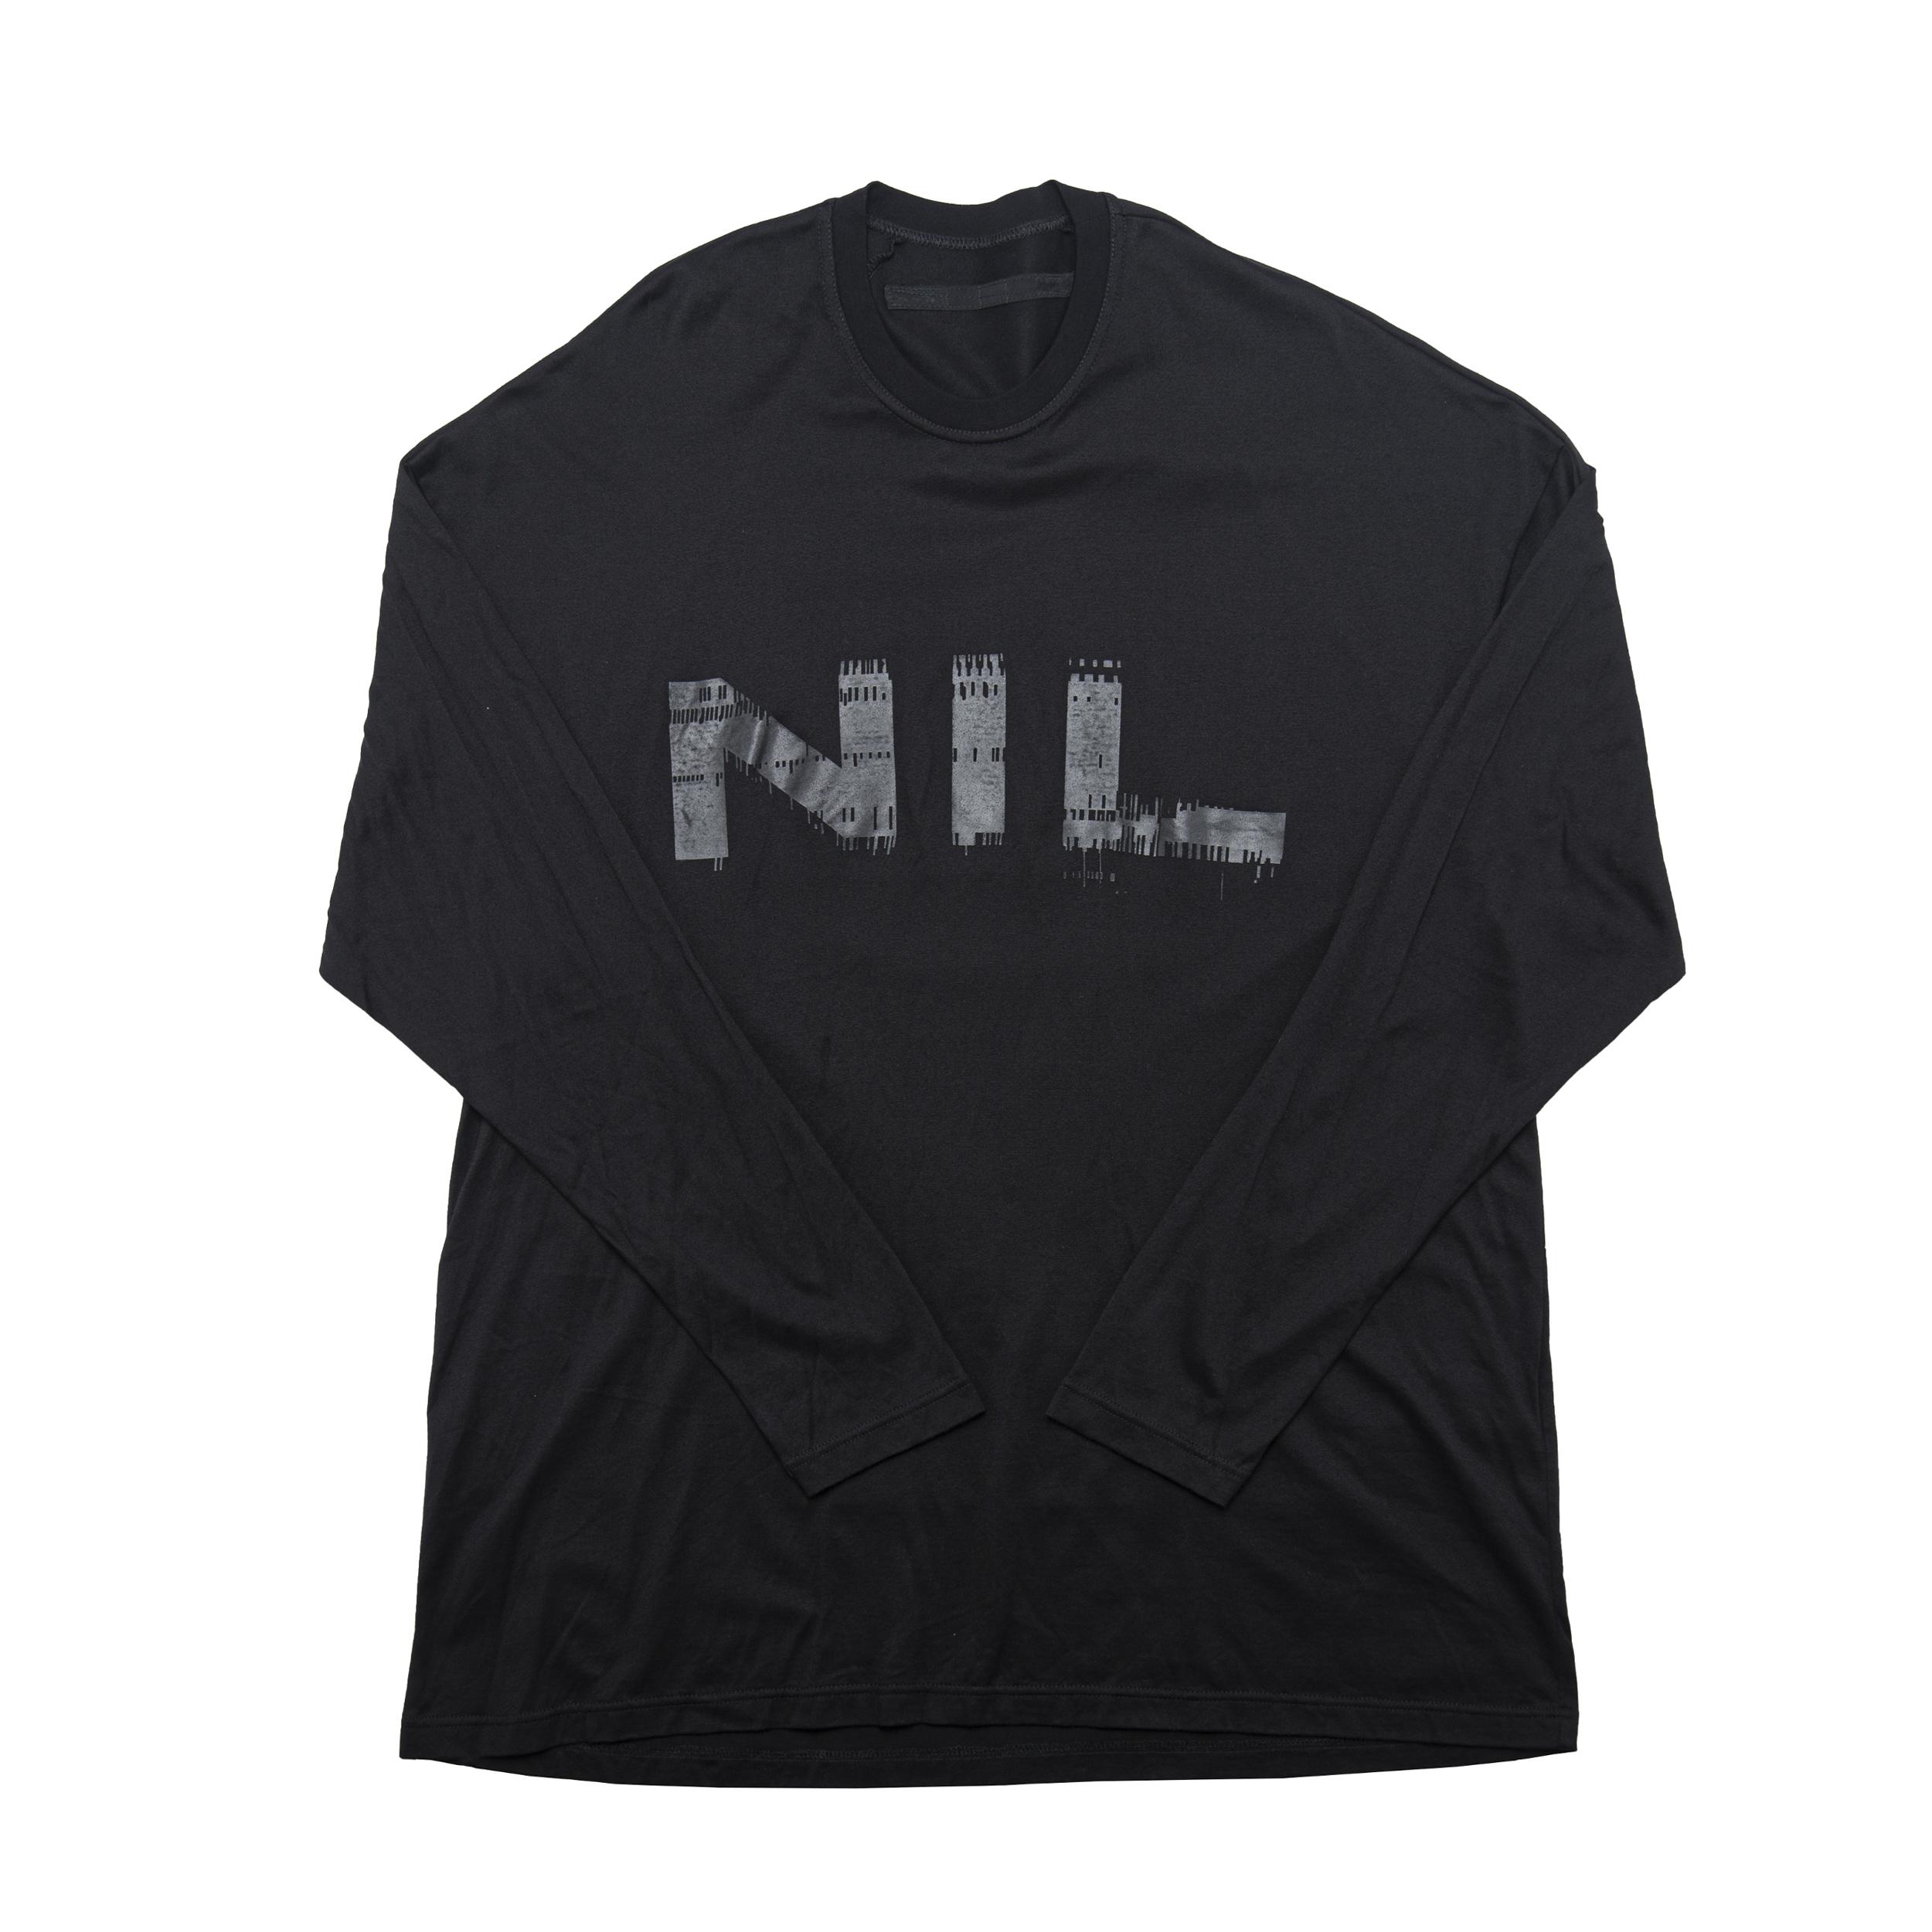 680CPM11-BK×BK / NIL ロングスリーブシャツ